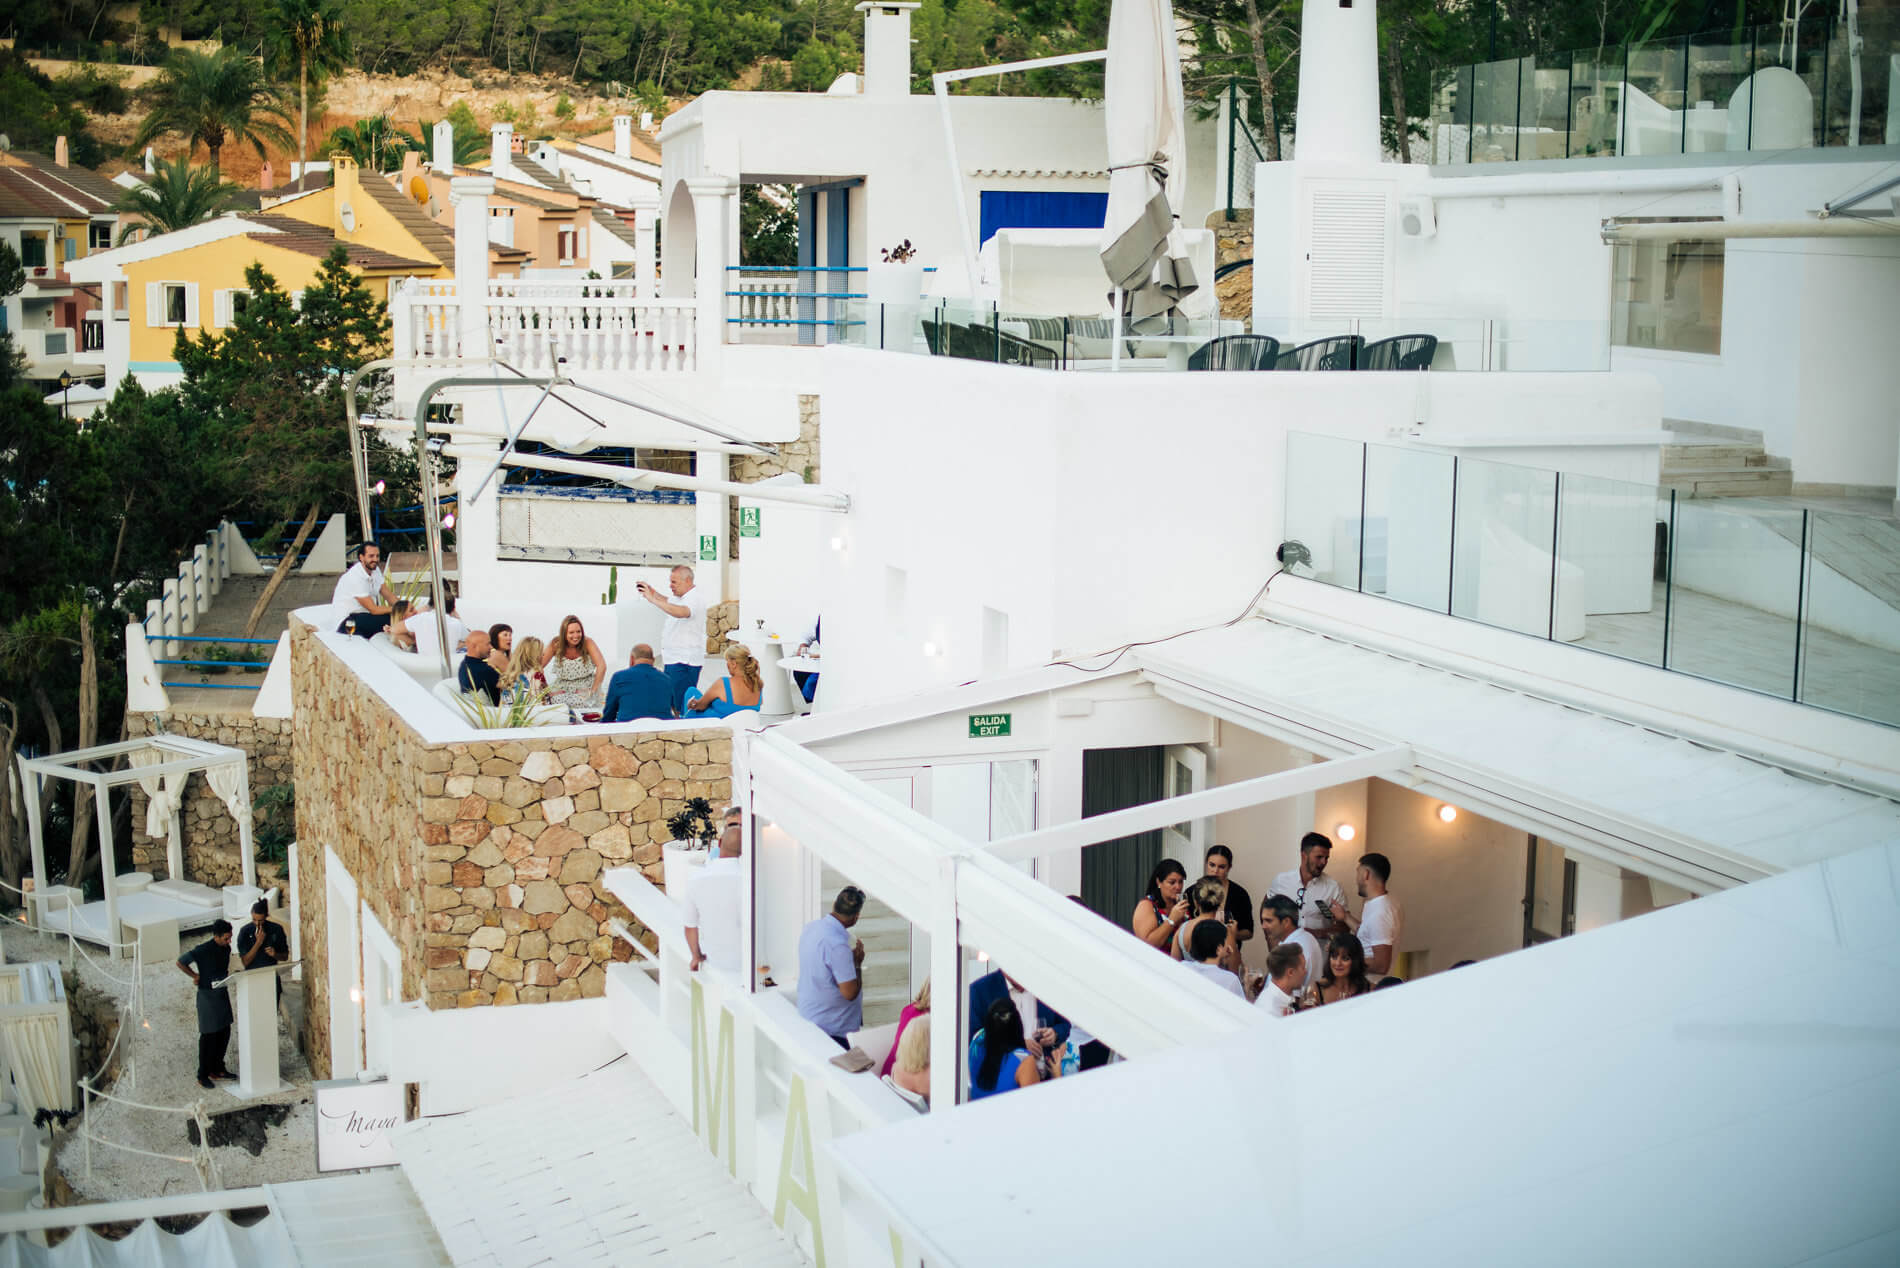 https://www.white-ibiza.com/wp-content/uploads/2020/03/ibiza-wedding-venue-maya-beach-club-2020-01.jpg